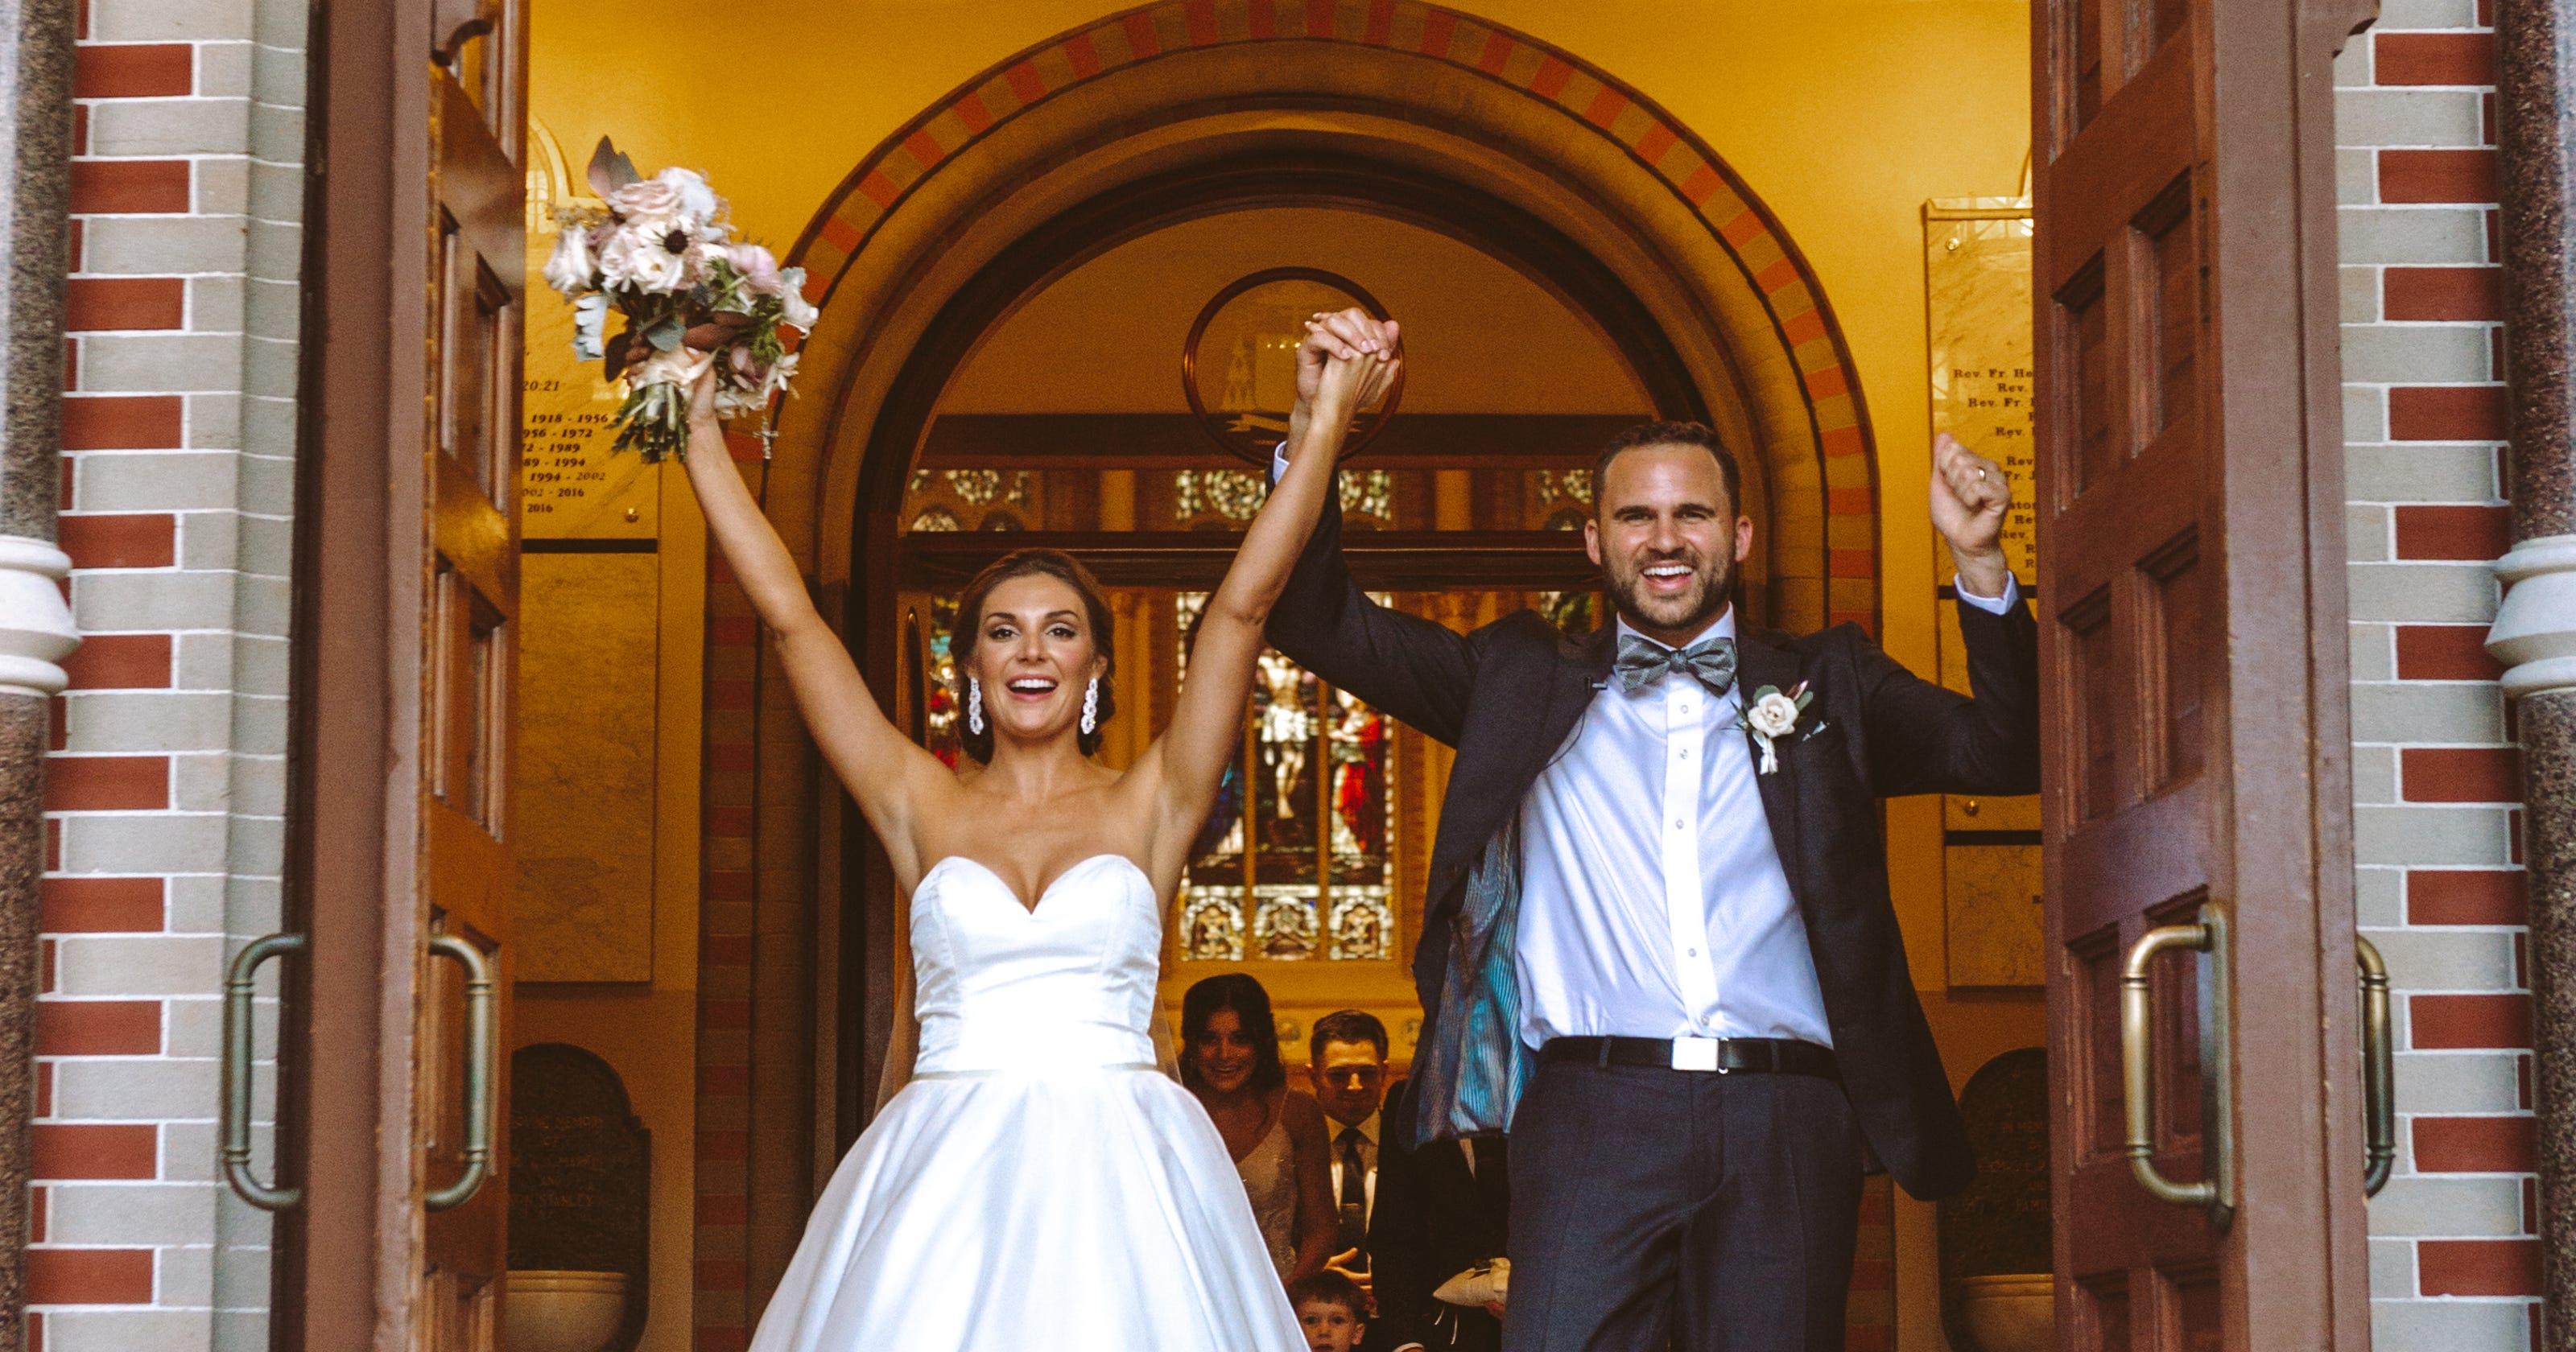 Erin Edmiston, Katharine Michot share their wedding styles